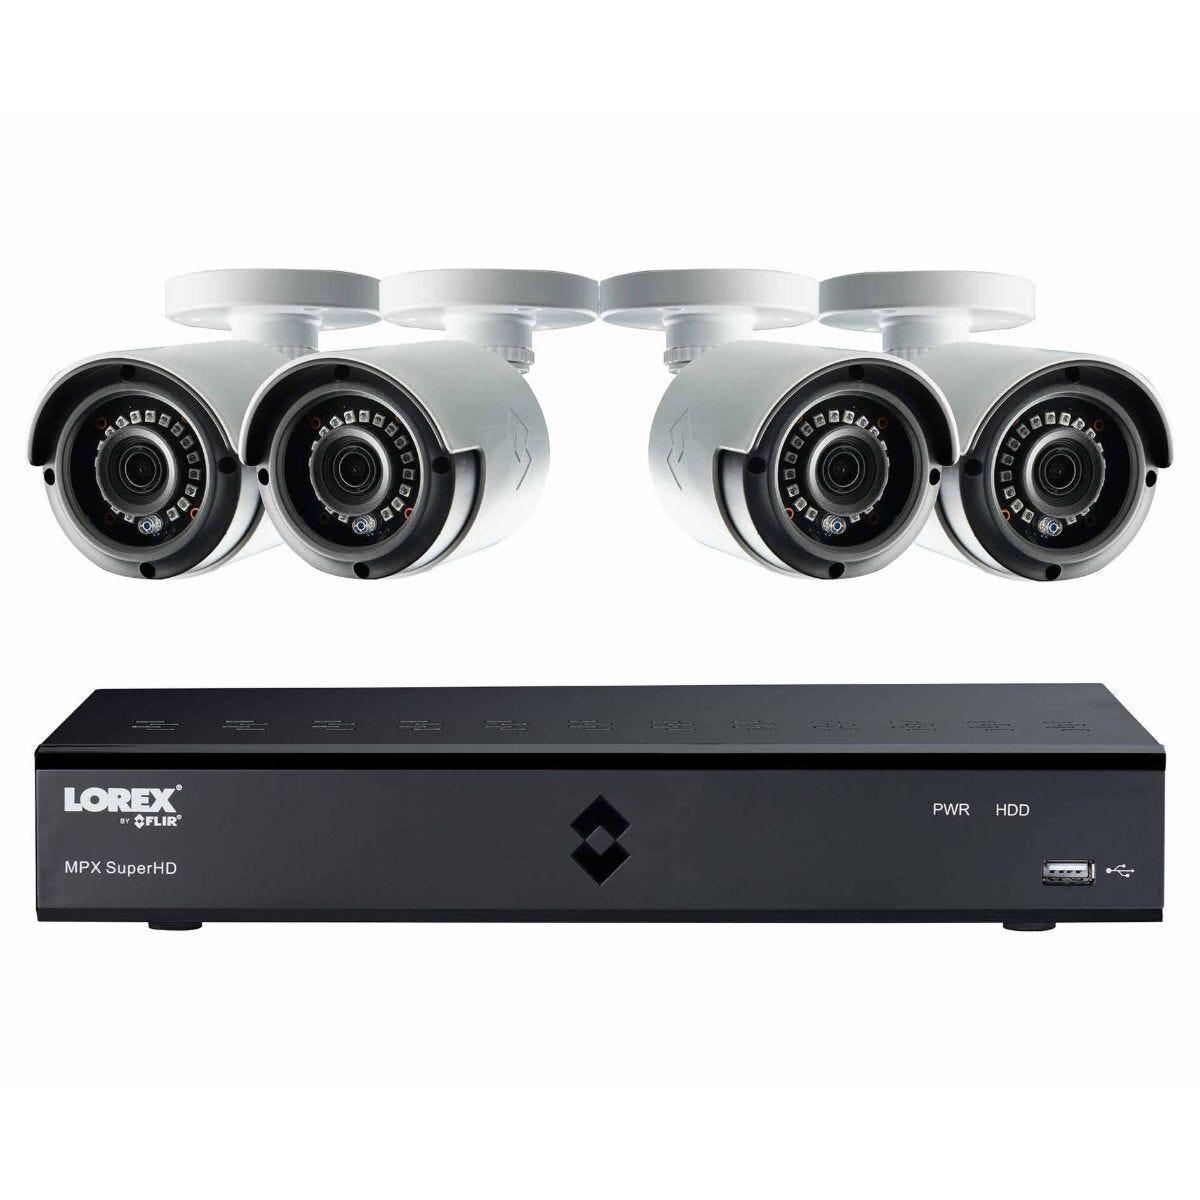 Lorex 8 Channel 2TB DVR with 4 x 4MP Super HD Cameras